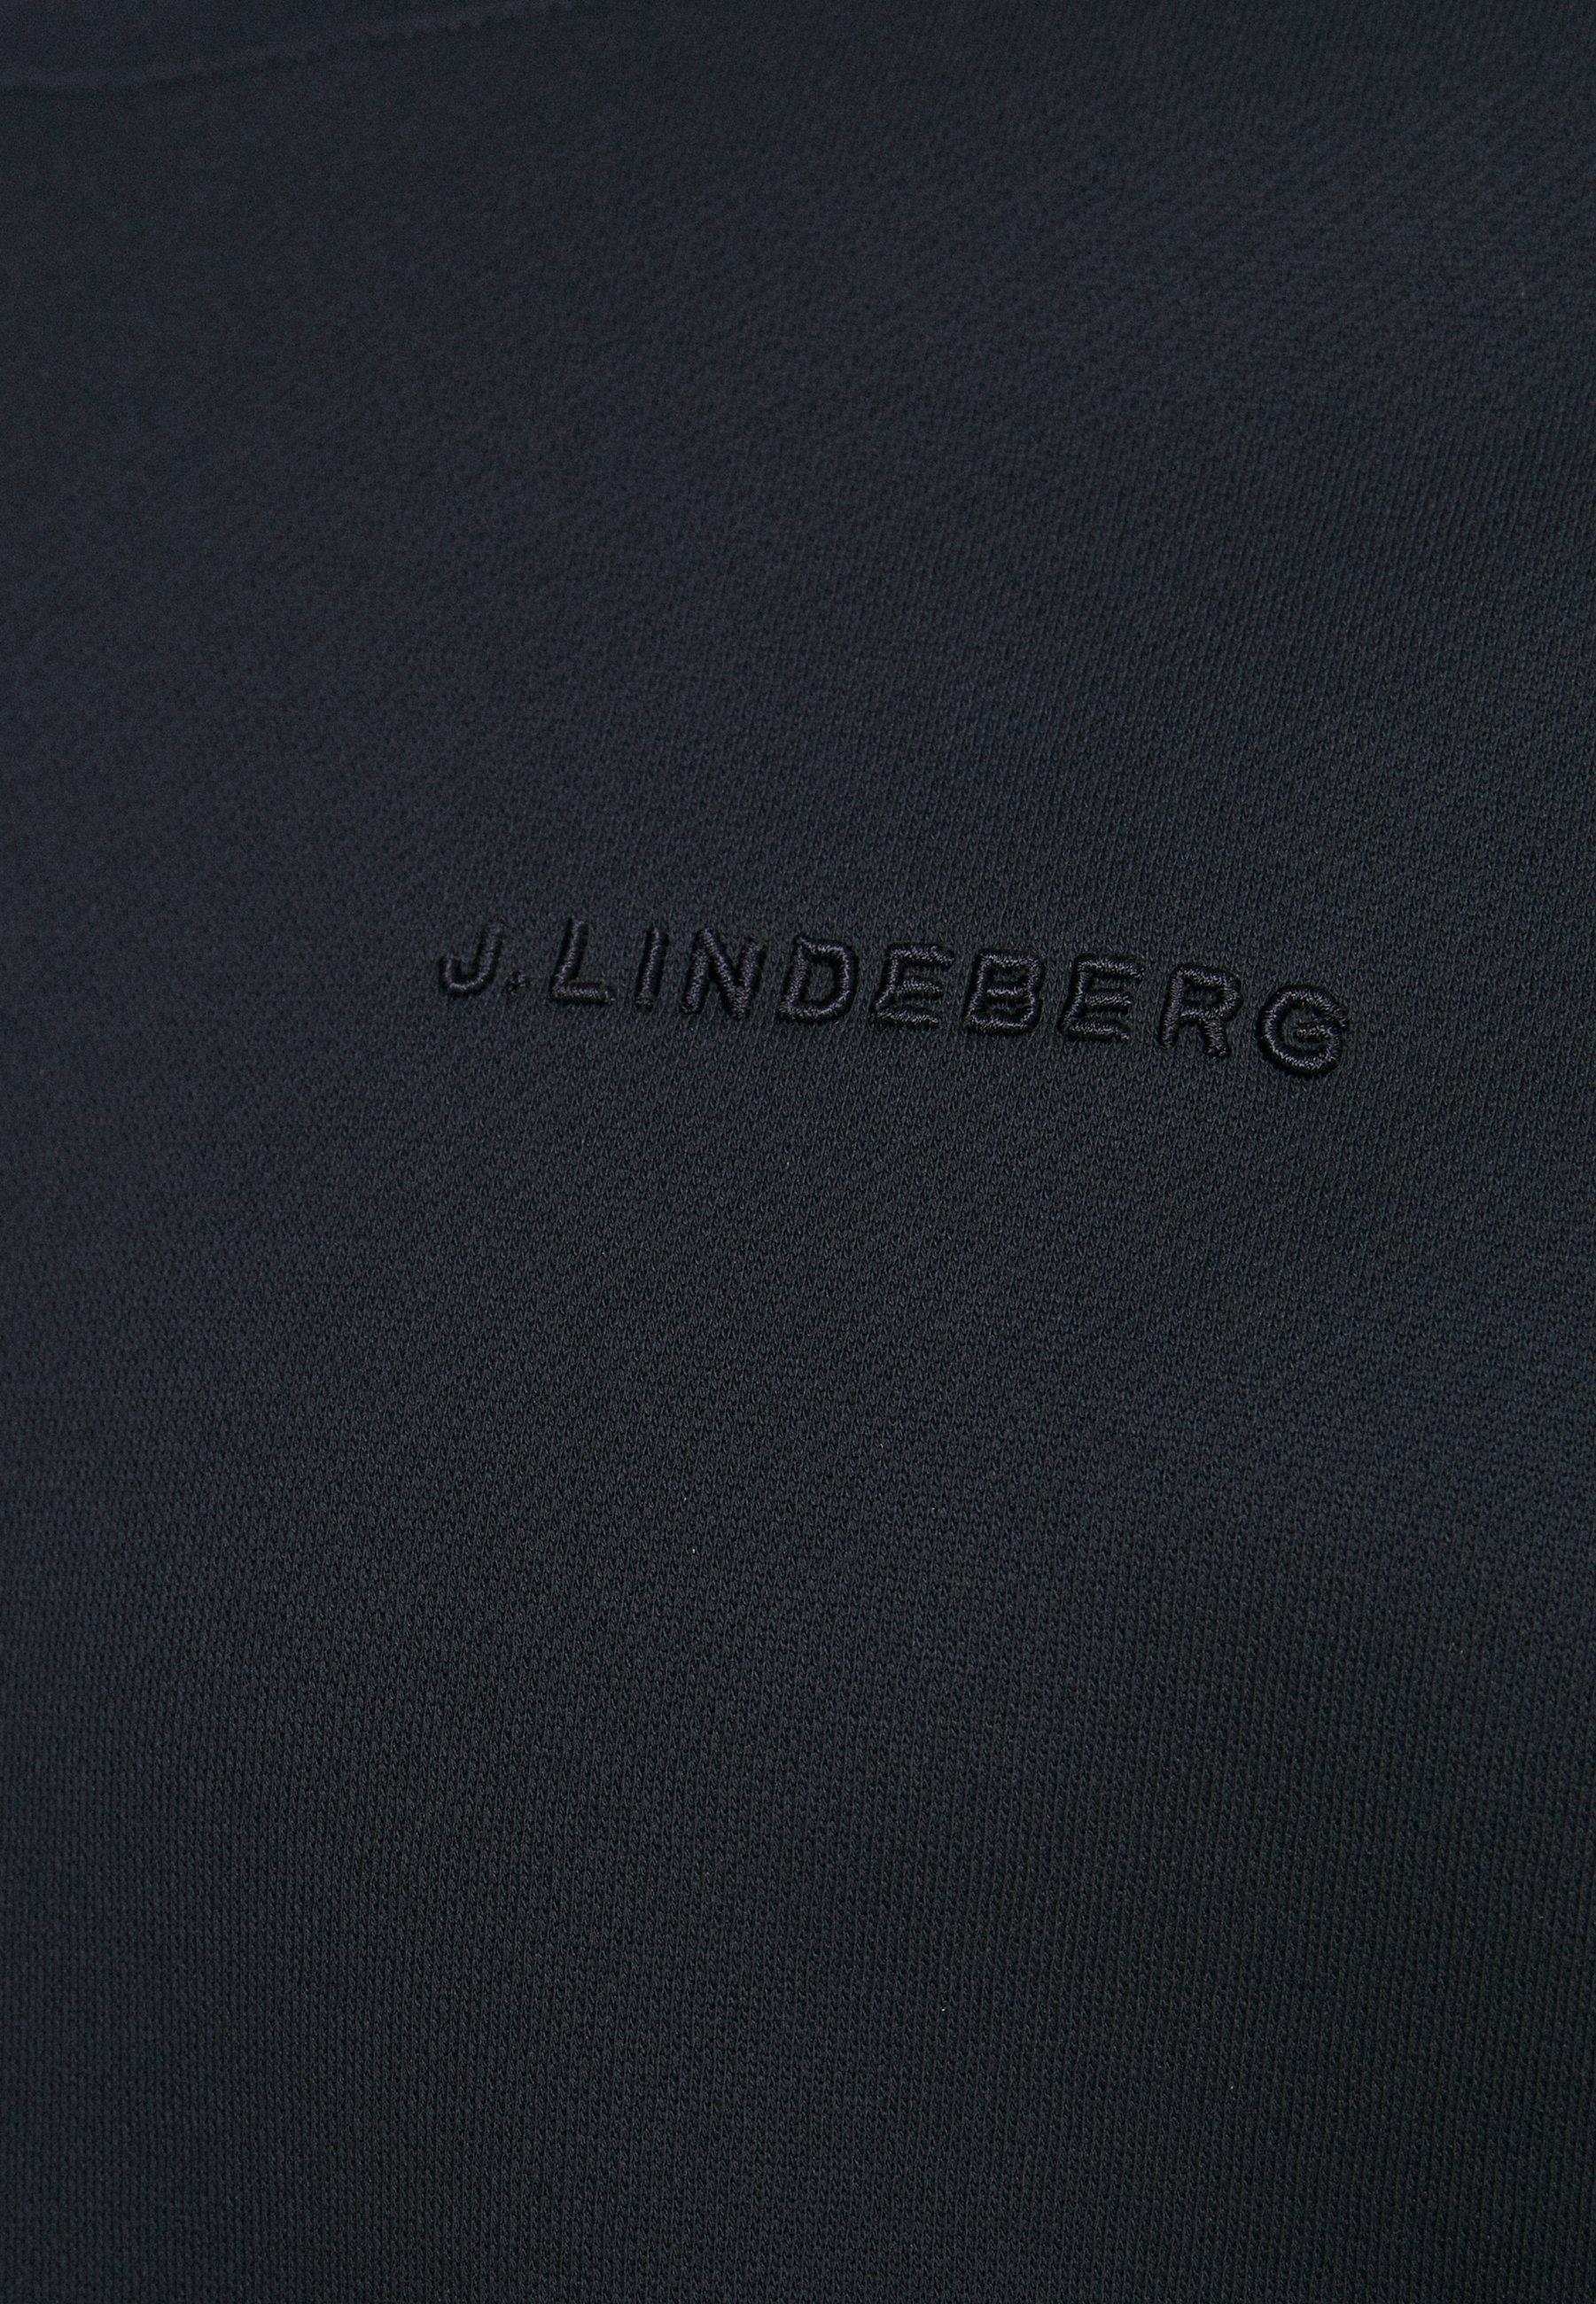 J.lindeberg Chip - Bluza Navy